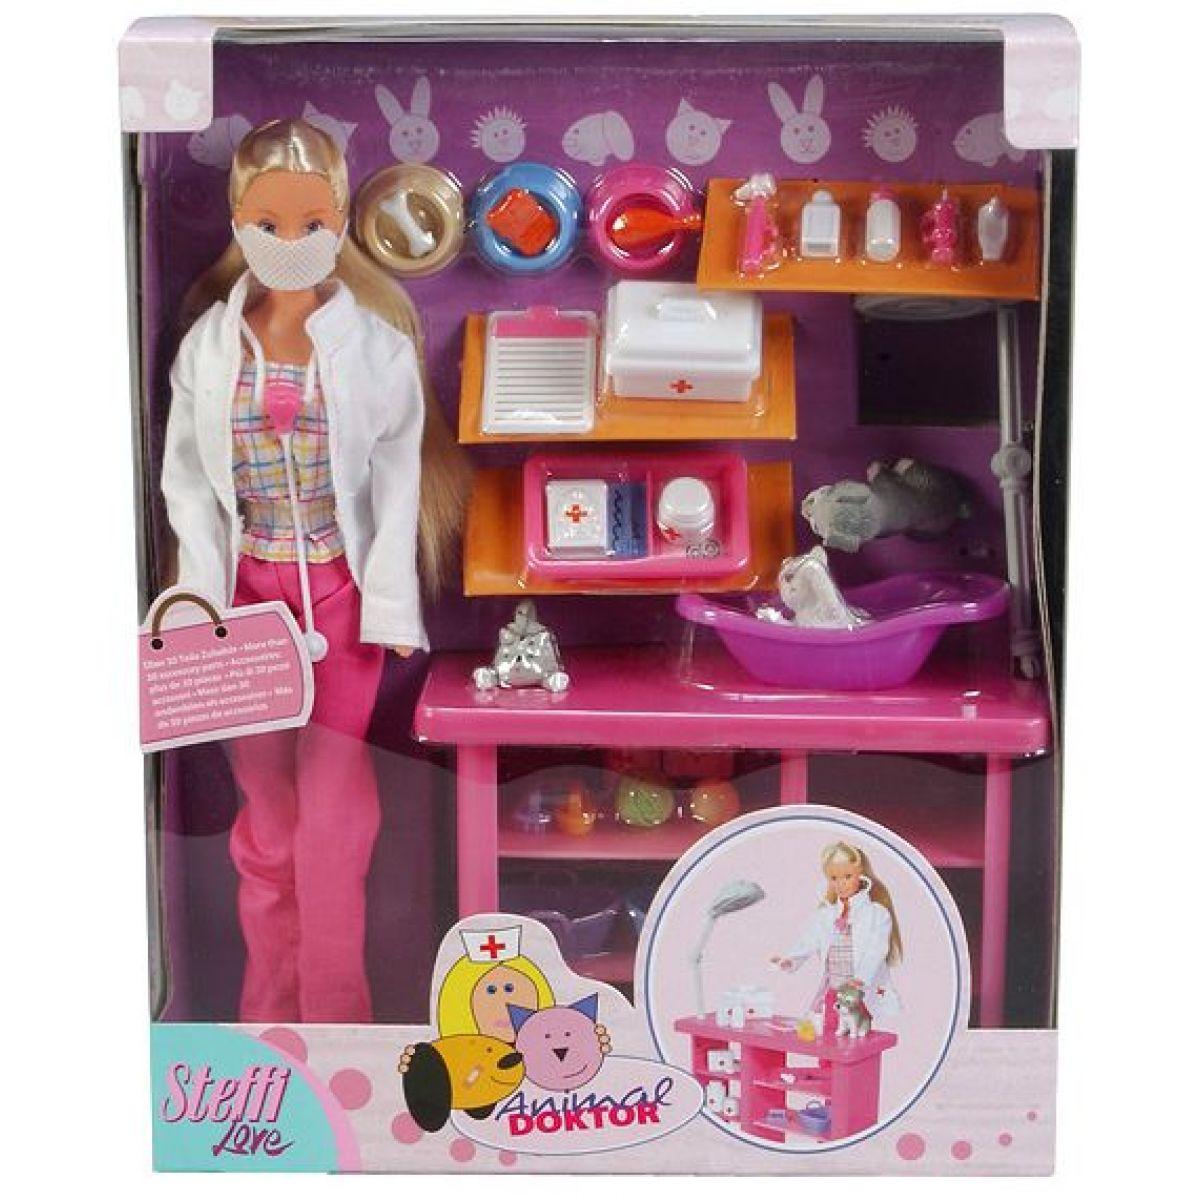 Steffi Love Panenka zvířecí doktorka